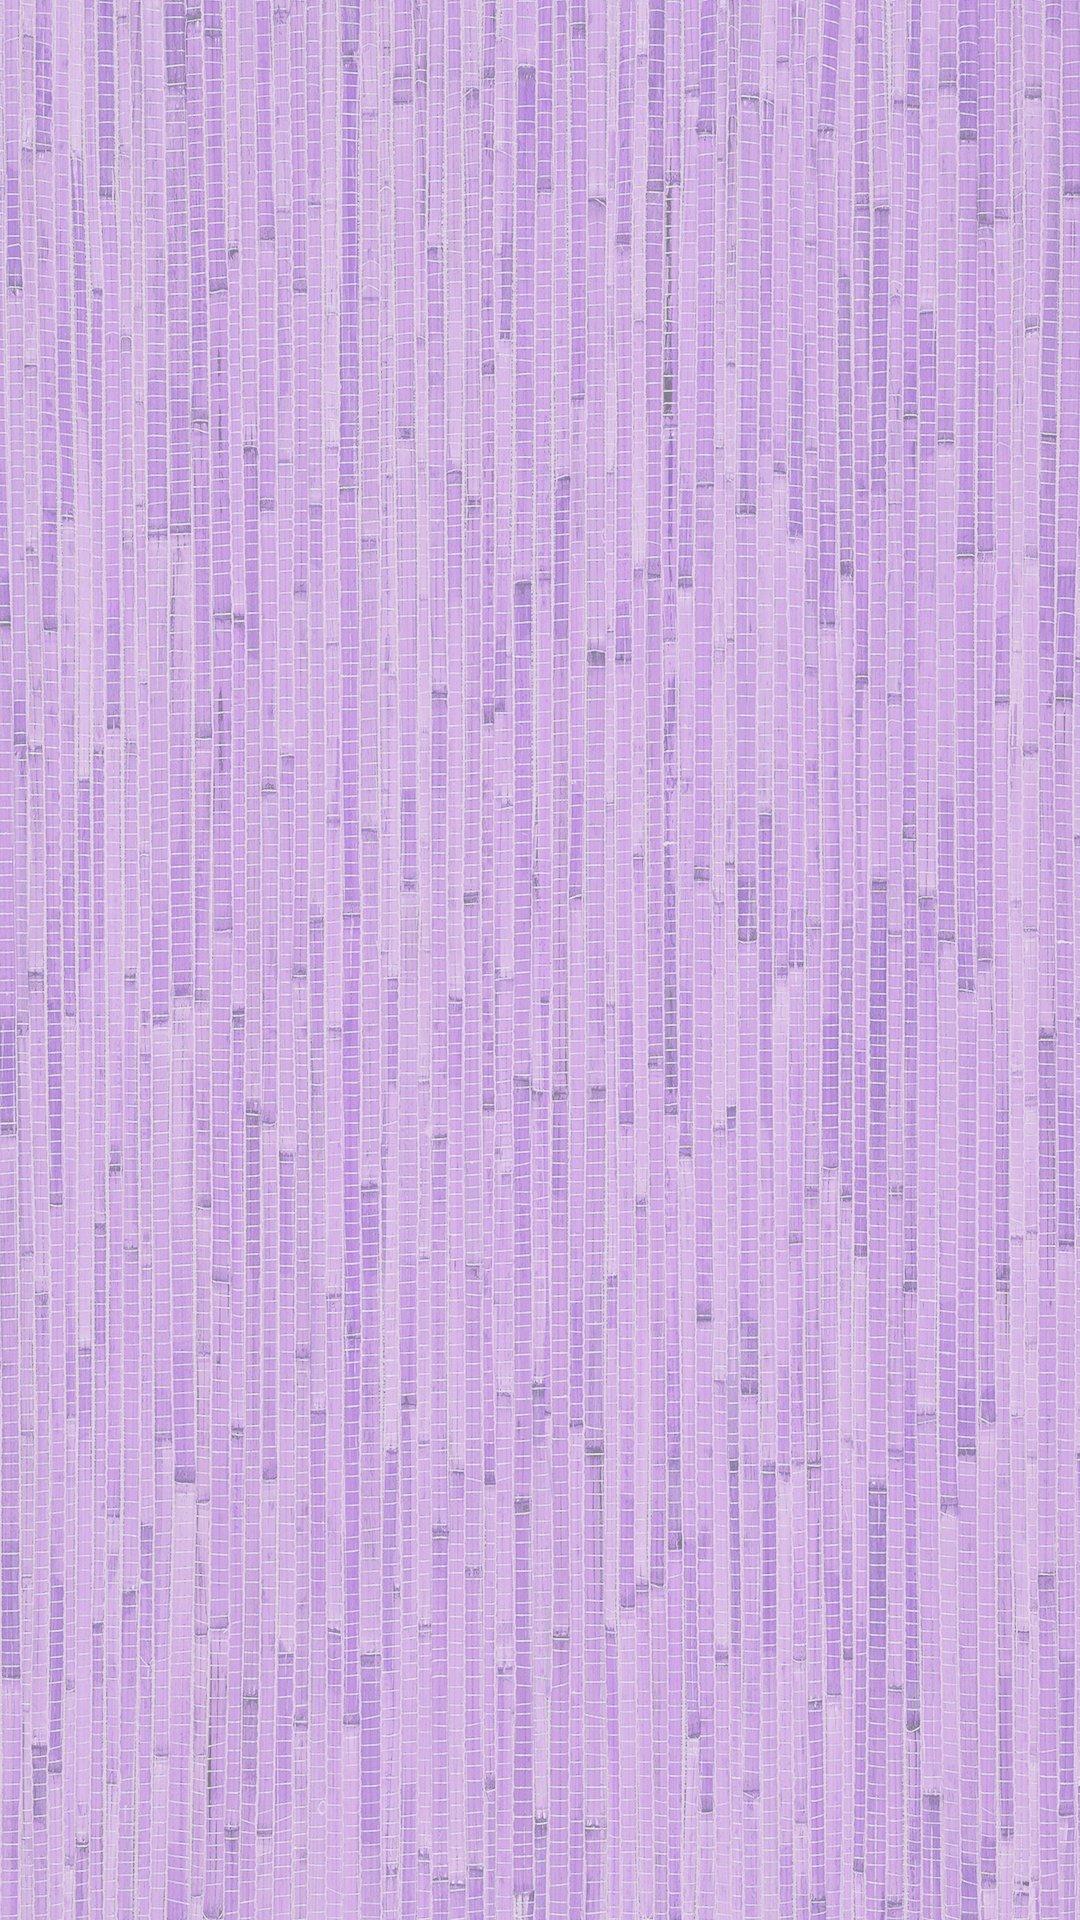 Background Ungu Pastel 1080x1920 Download Hd Wallpaper Wallpapertip